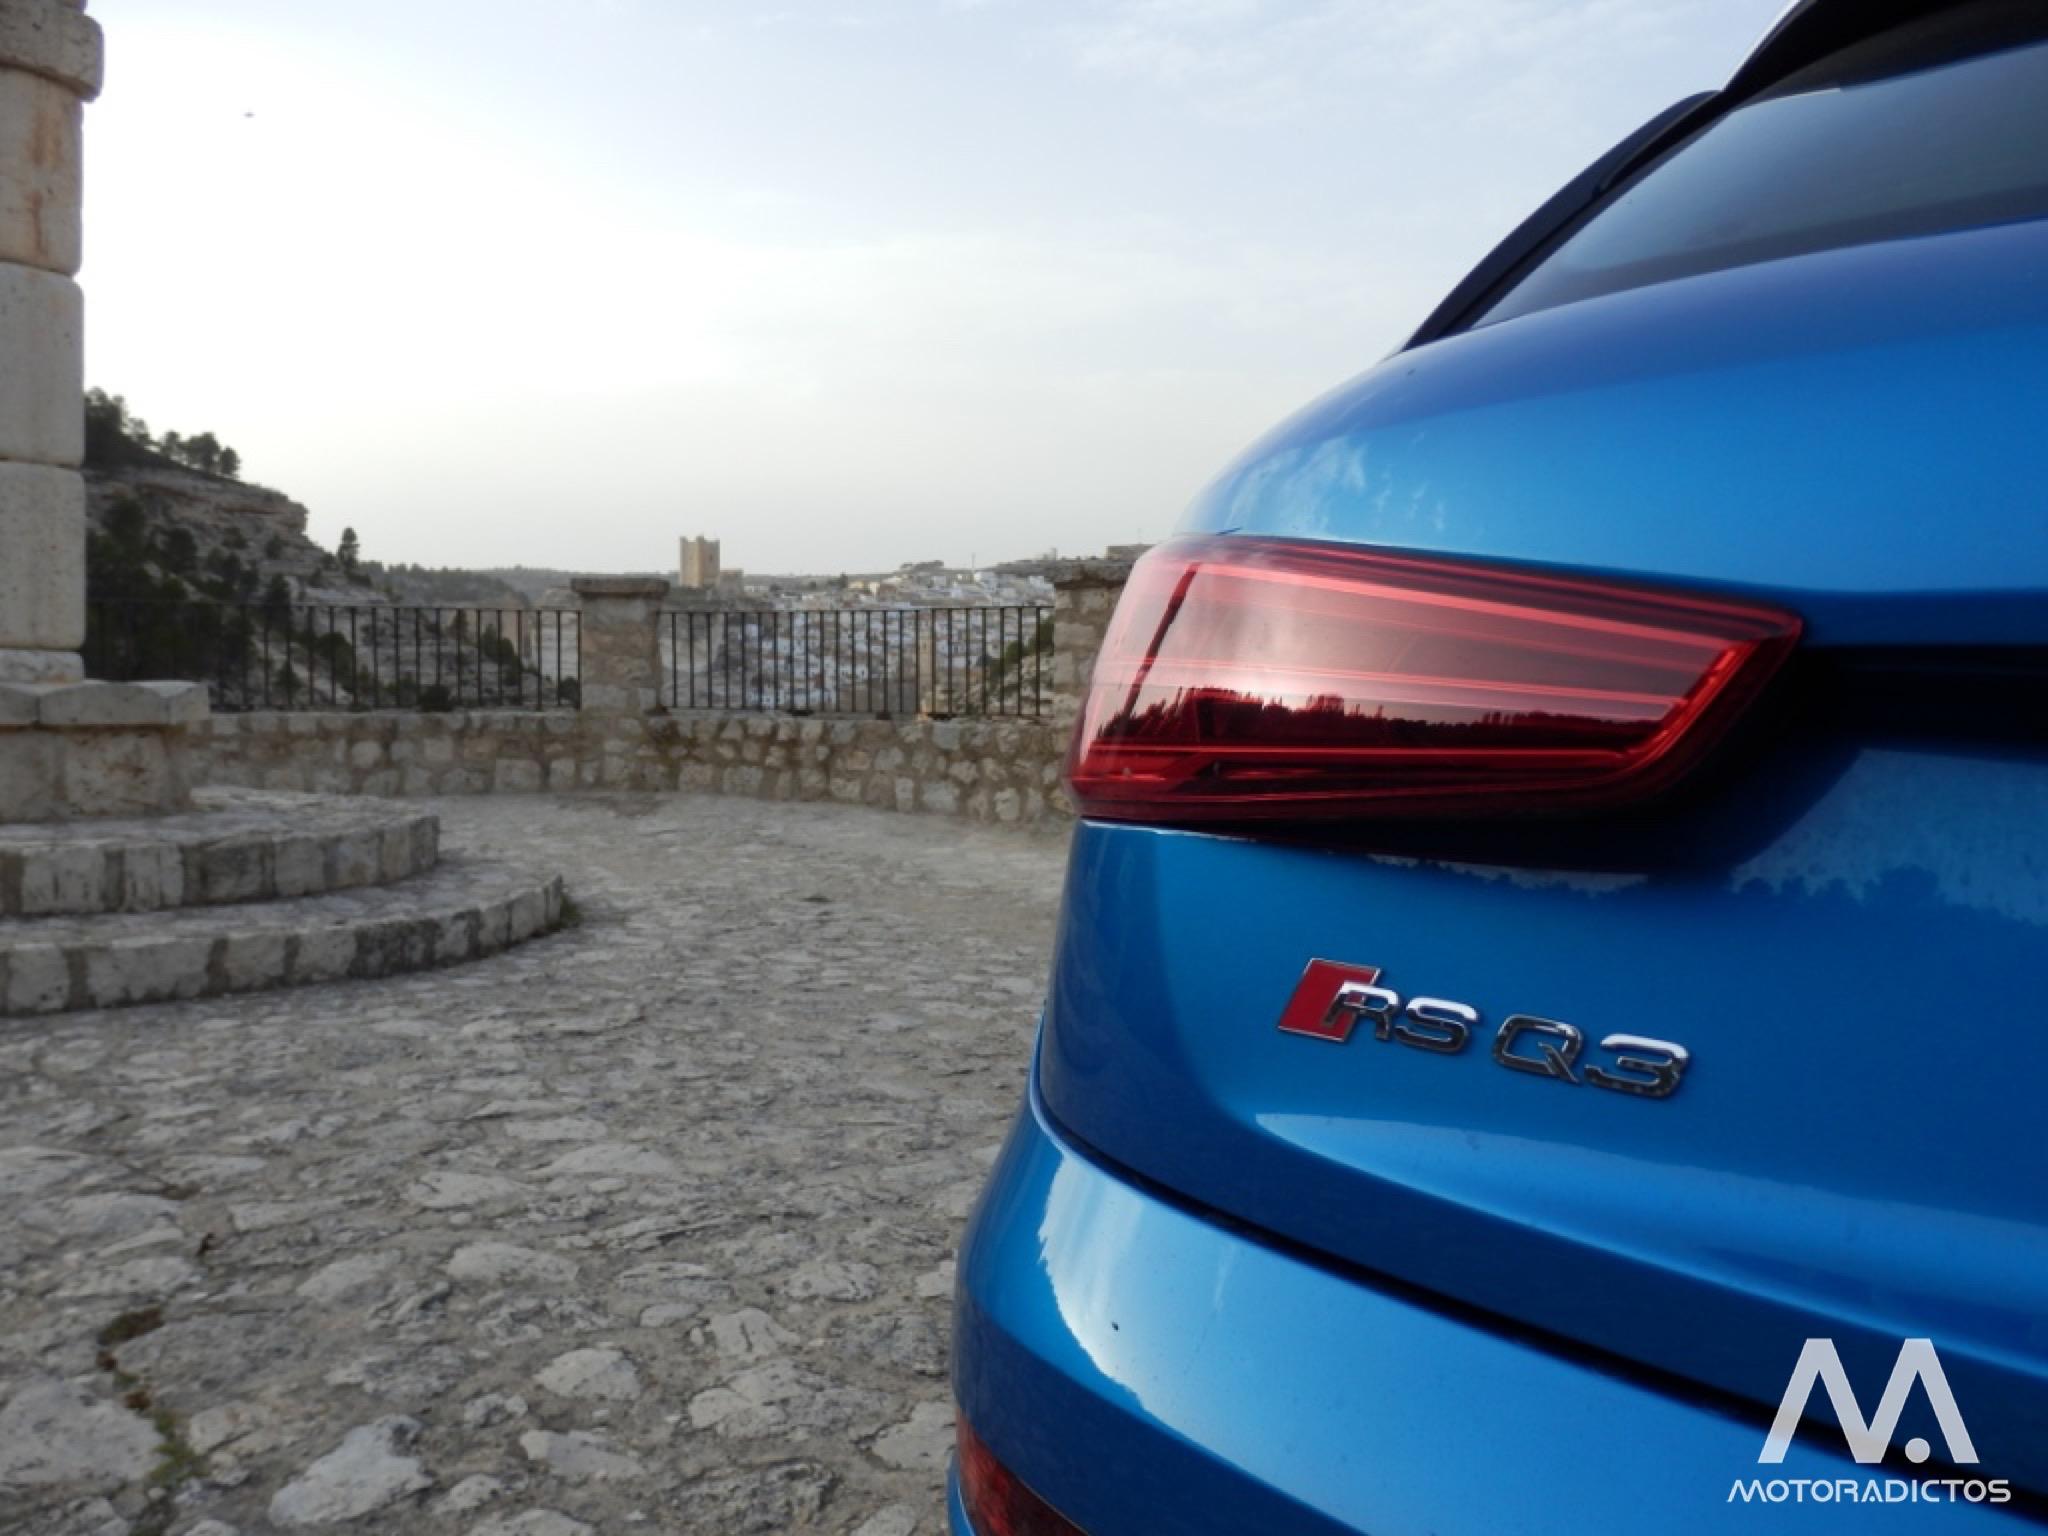 Prueba: Audi RS Q3 2.5 TFSI 340 CV (diseño, habitáculo, mecánica) 16